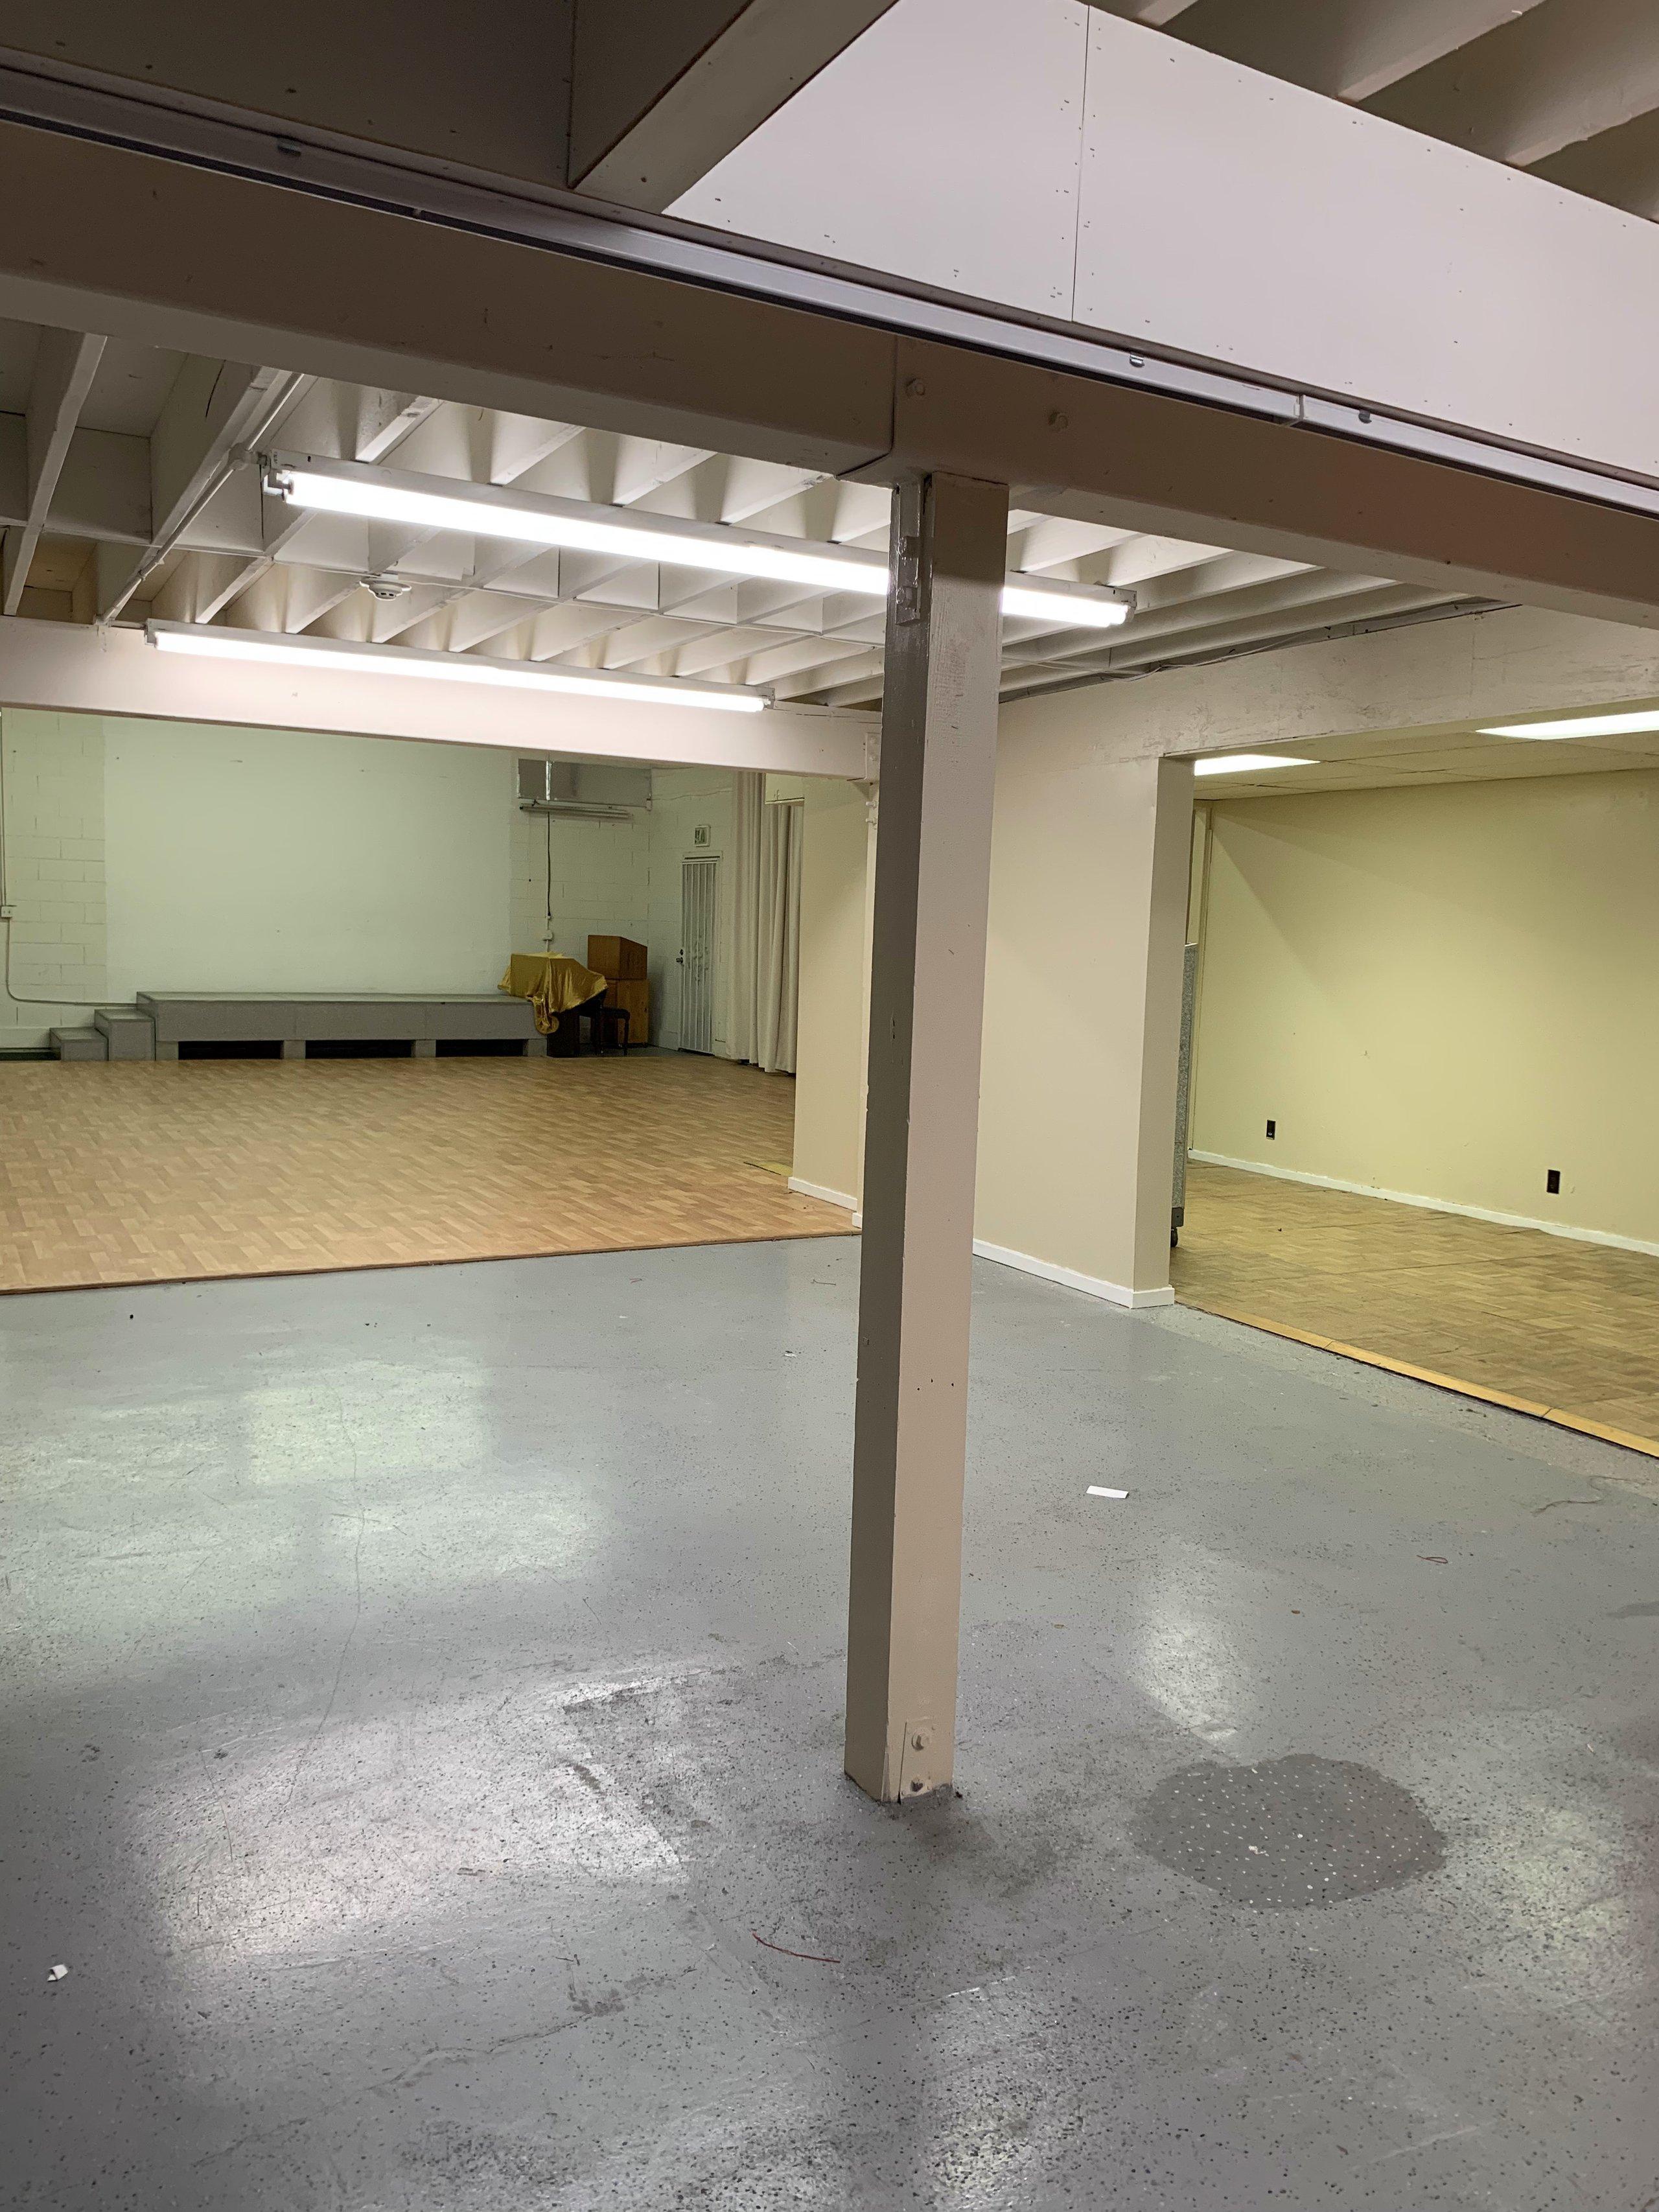 68x29 Warehouse self storage unit